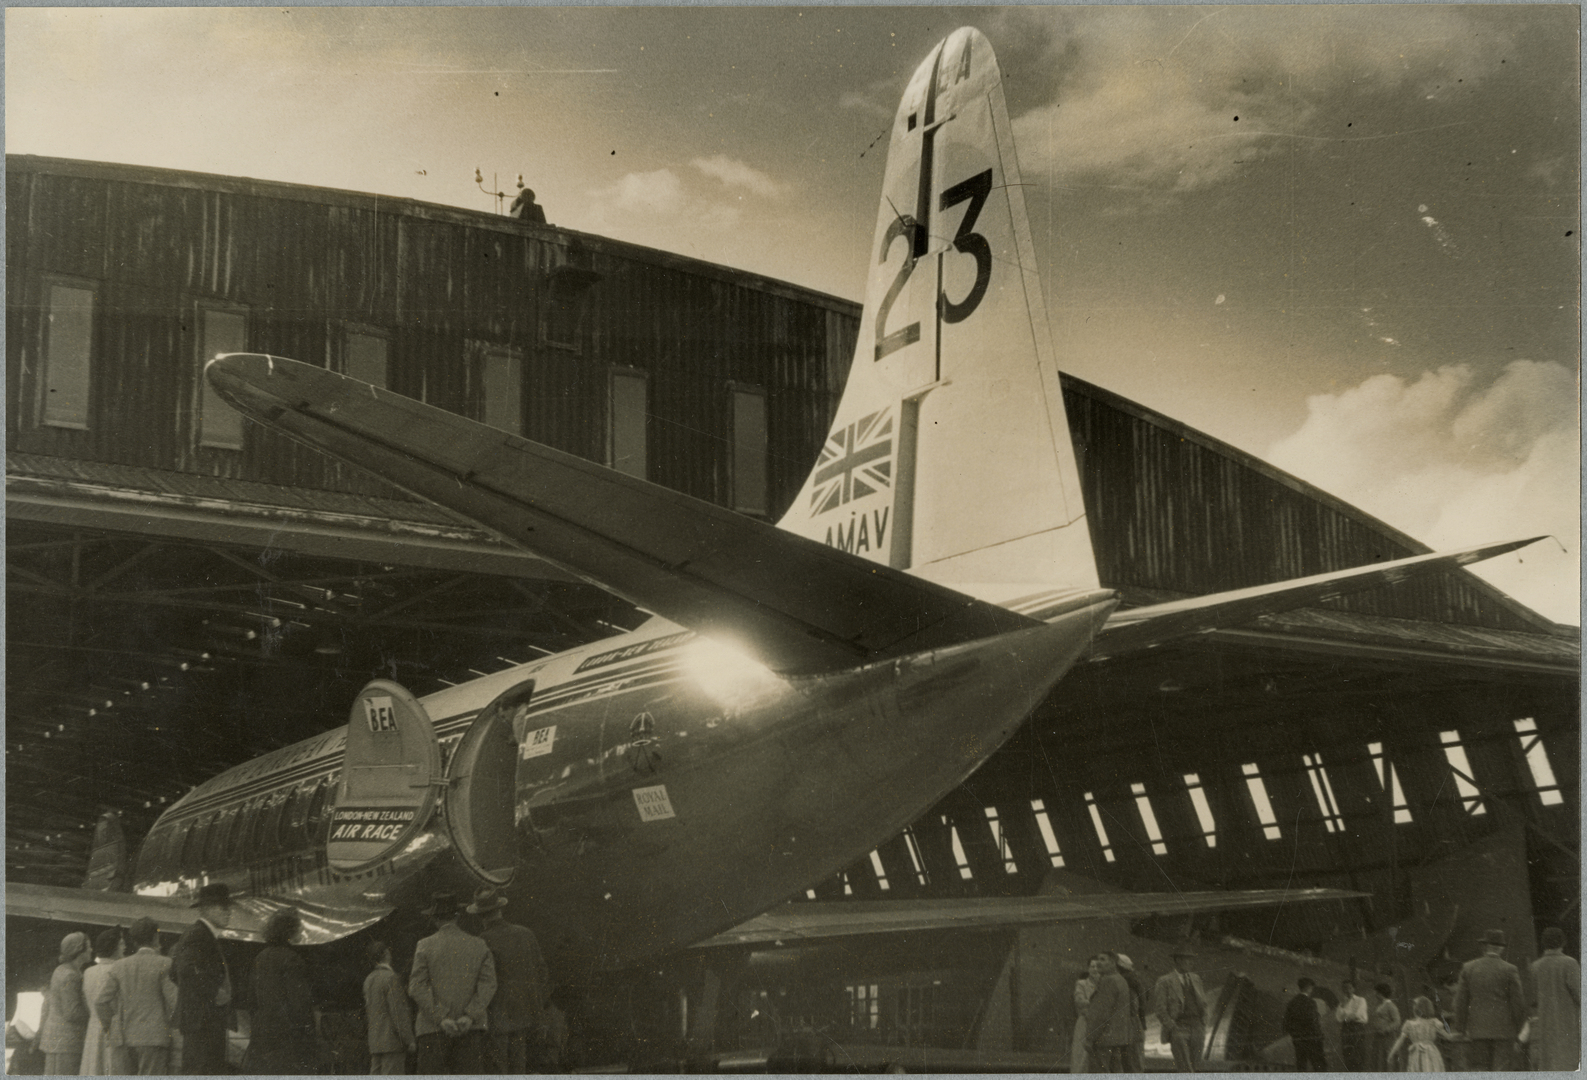 Tail of British European Airways Vickers Viscount 701. October 1953.